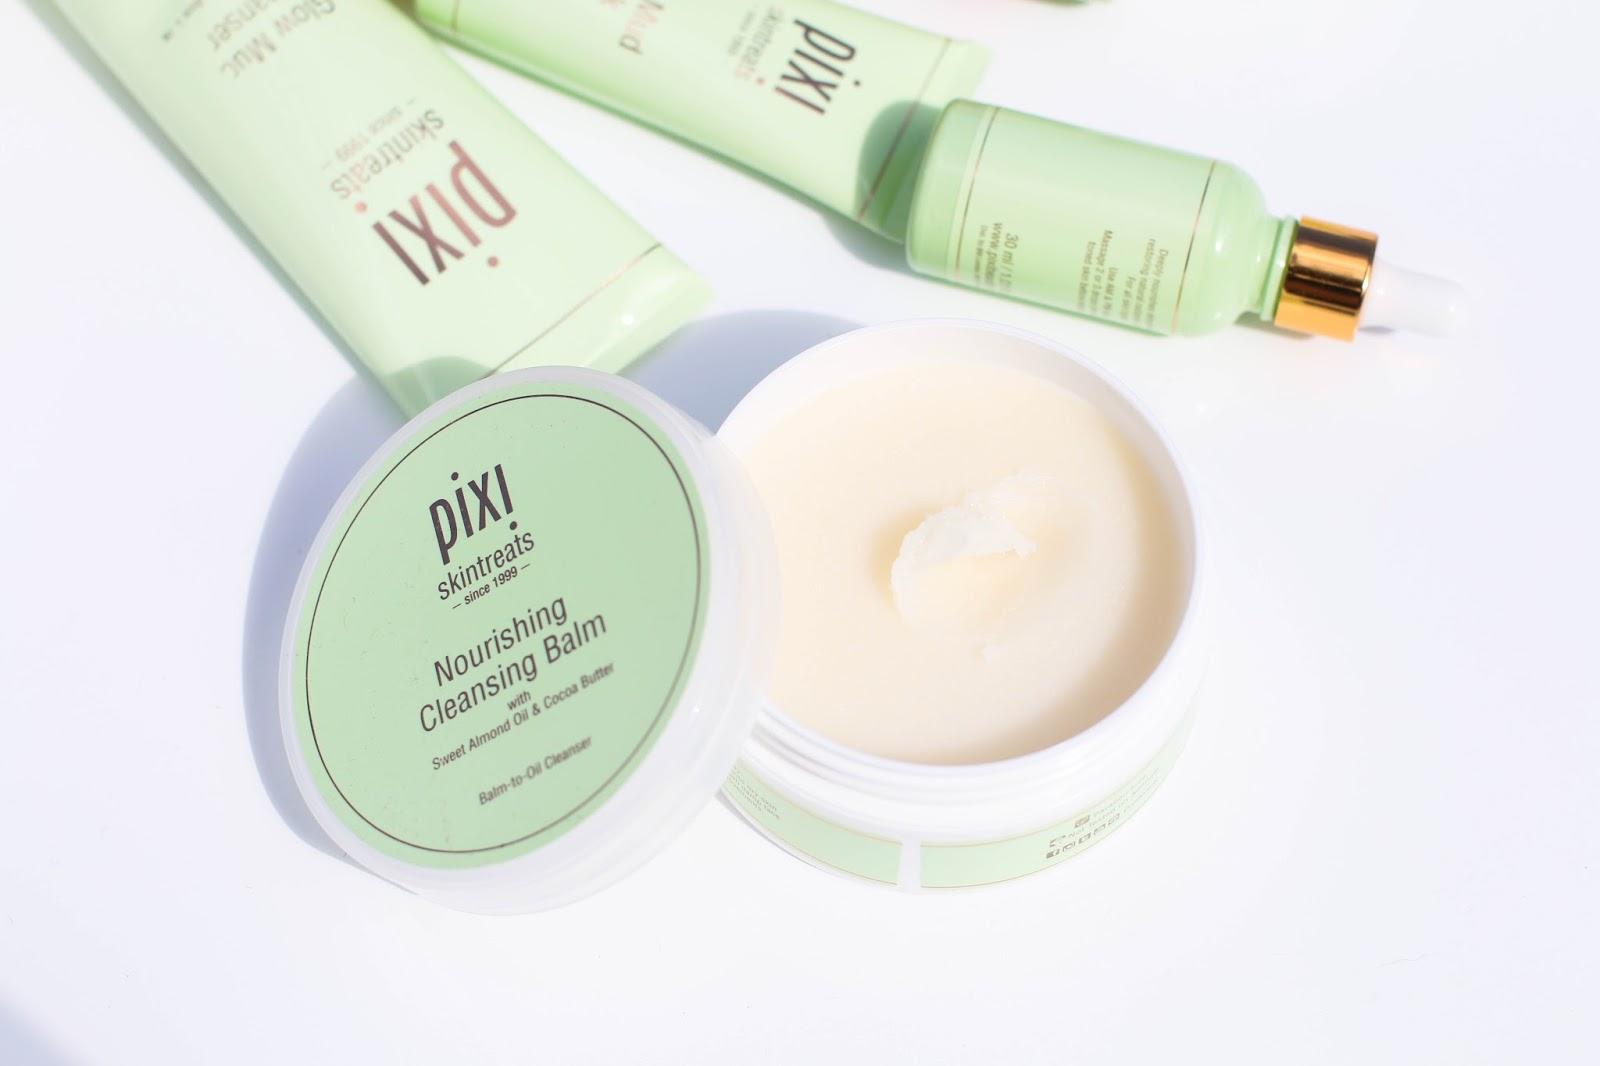 Pixi Nourishing Cleansing Balm review